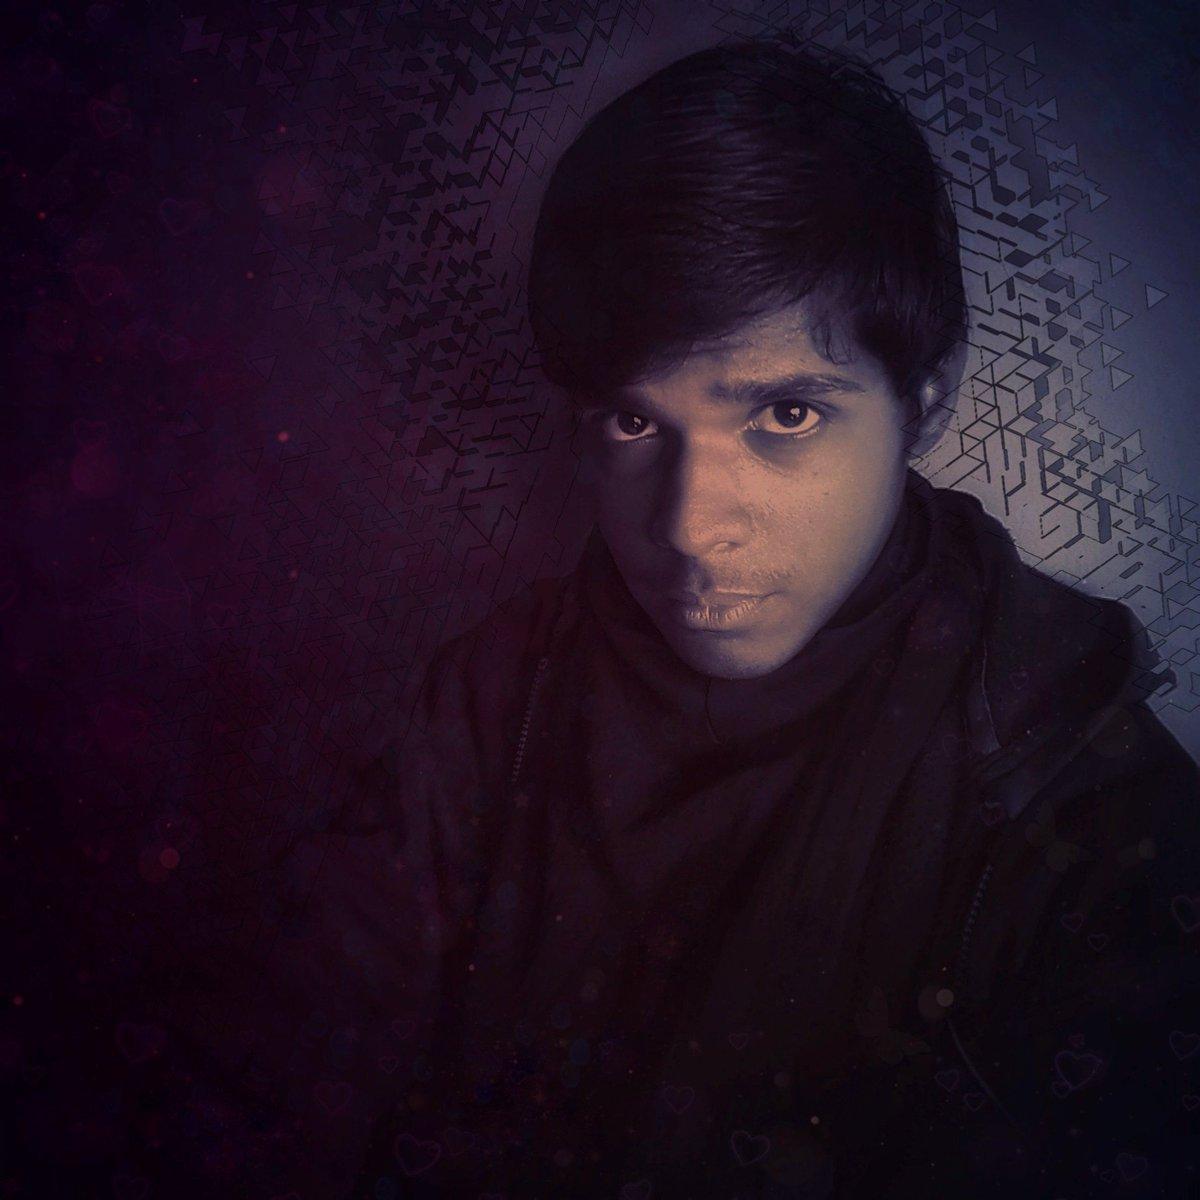 START WHERE YOU ARE.  USE WHAT YOU HAVE.  DO WHAT YOU CAN.  #djbmc #dj #djproducer #musicproducer  #music #musician #love  #inspiration #tommorowland #ultramusic #martingarrix #edm  #inspirationalquote #motivationquotes #indiandj #keraladj #palakkaddj  #garrix #flstudio .pic.twitter.com/OQ3PnjNfTz